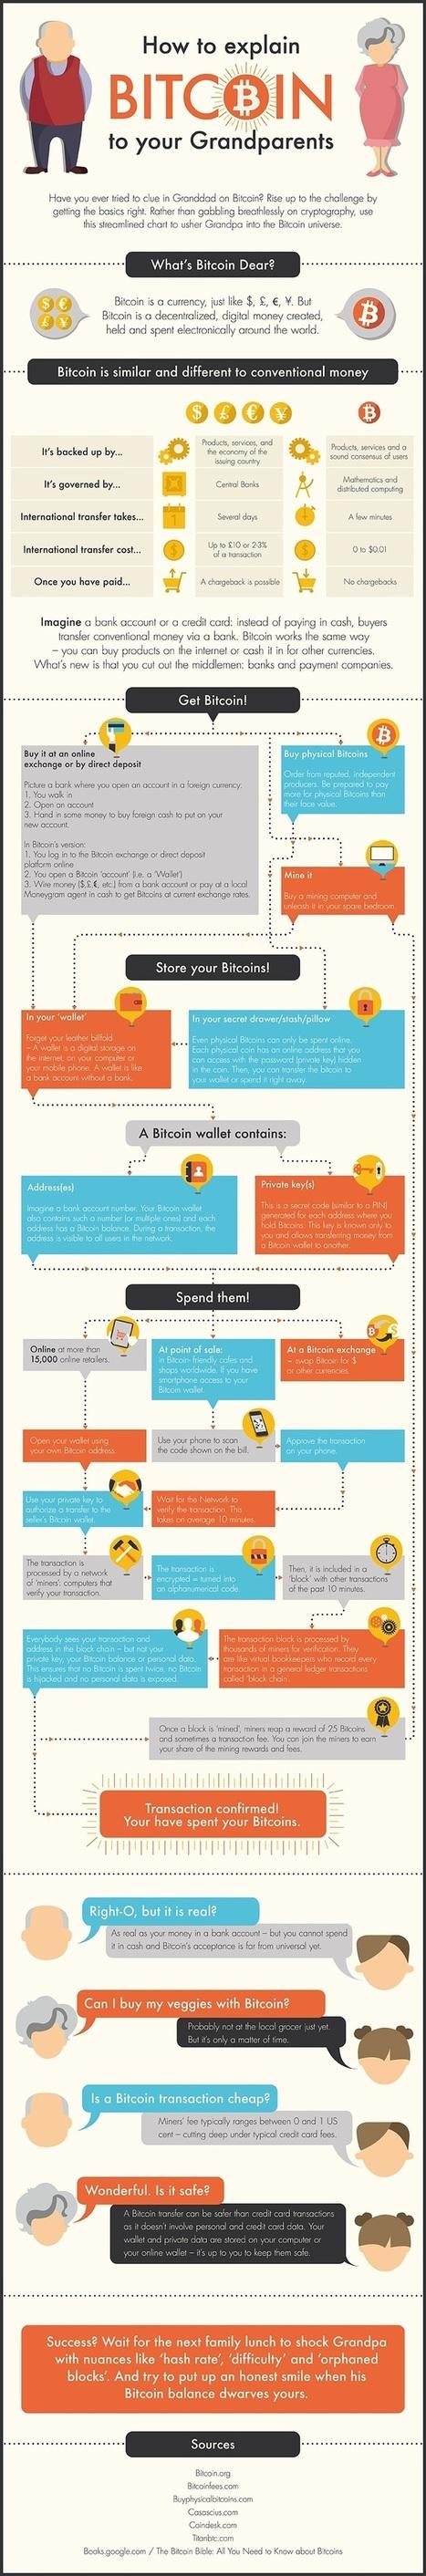 How To Explain Bitcoin To Grandma, Or Anybody Really [Infographic]   iPad   Scoop.it